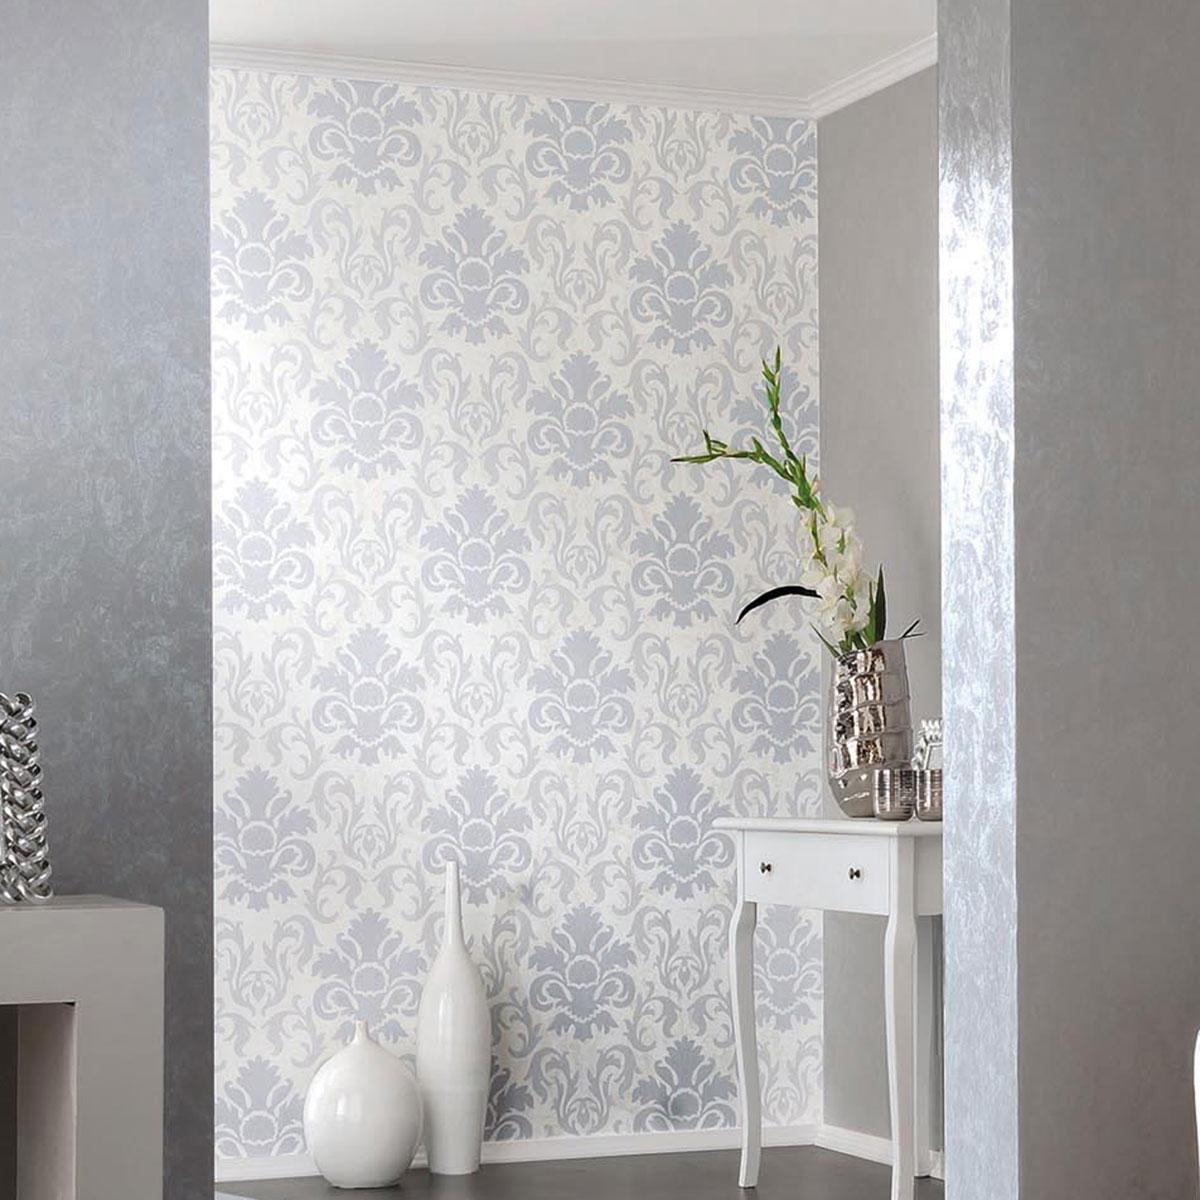 Carat Damask Glitter Wallpaper Silver and White